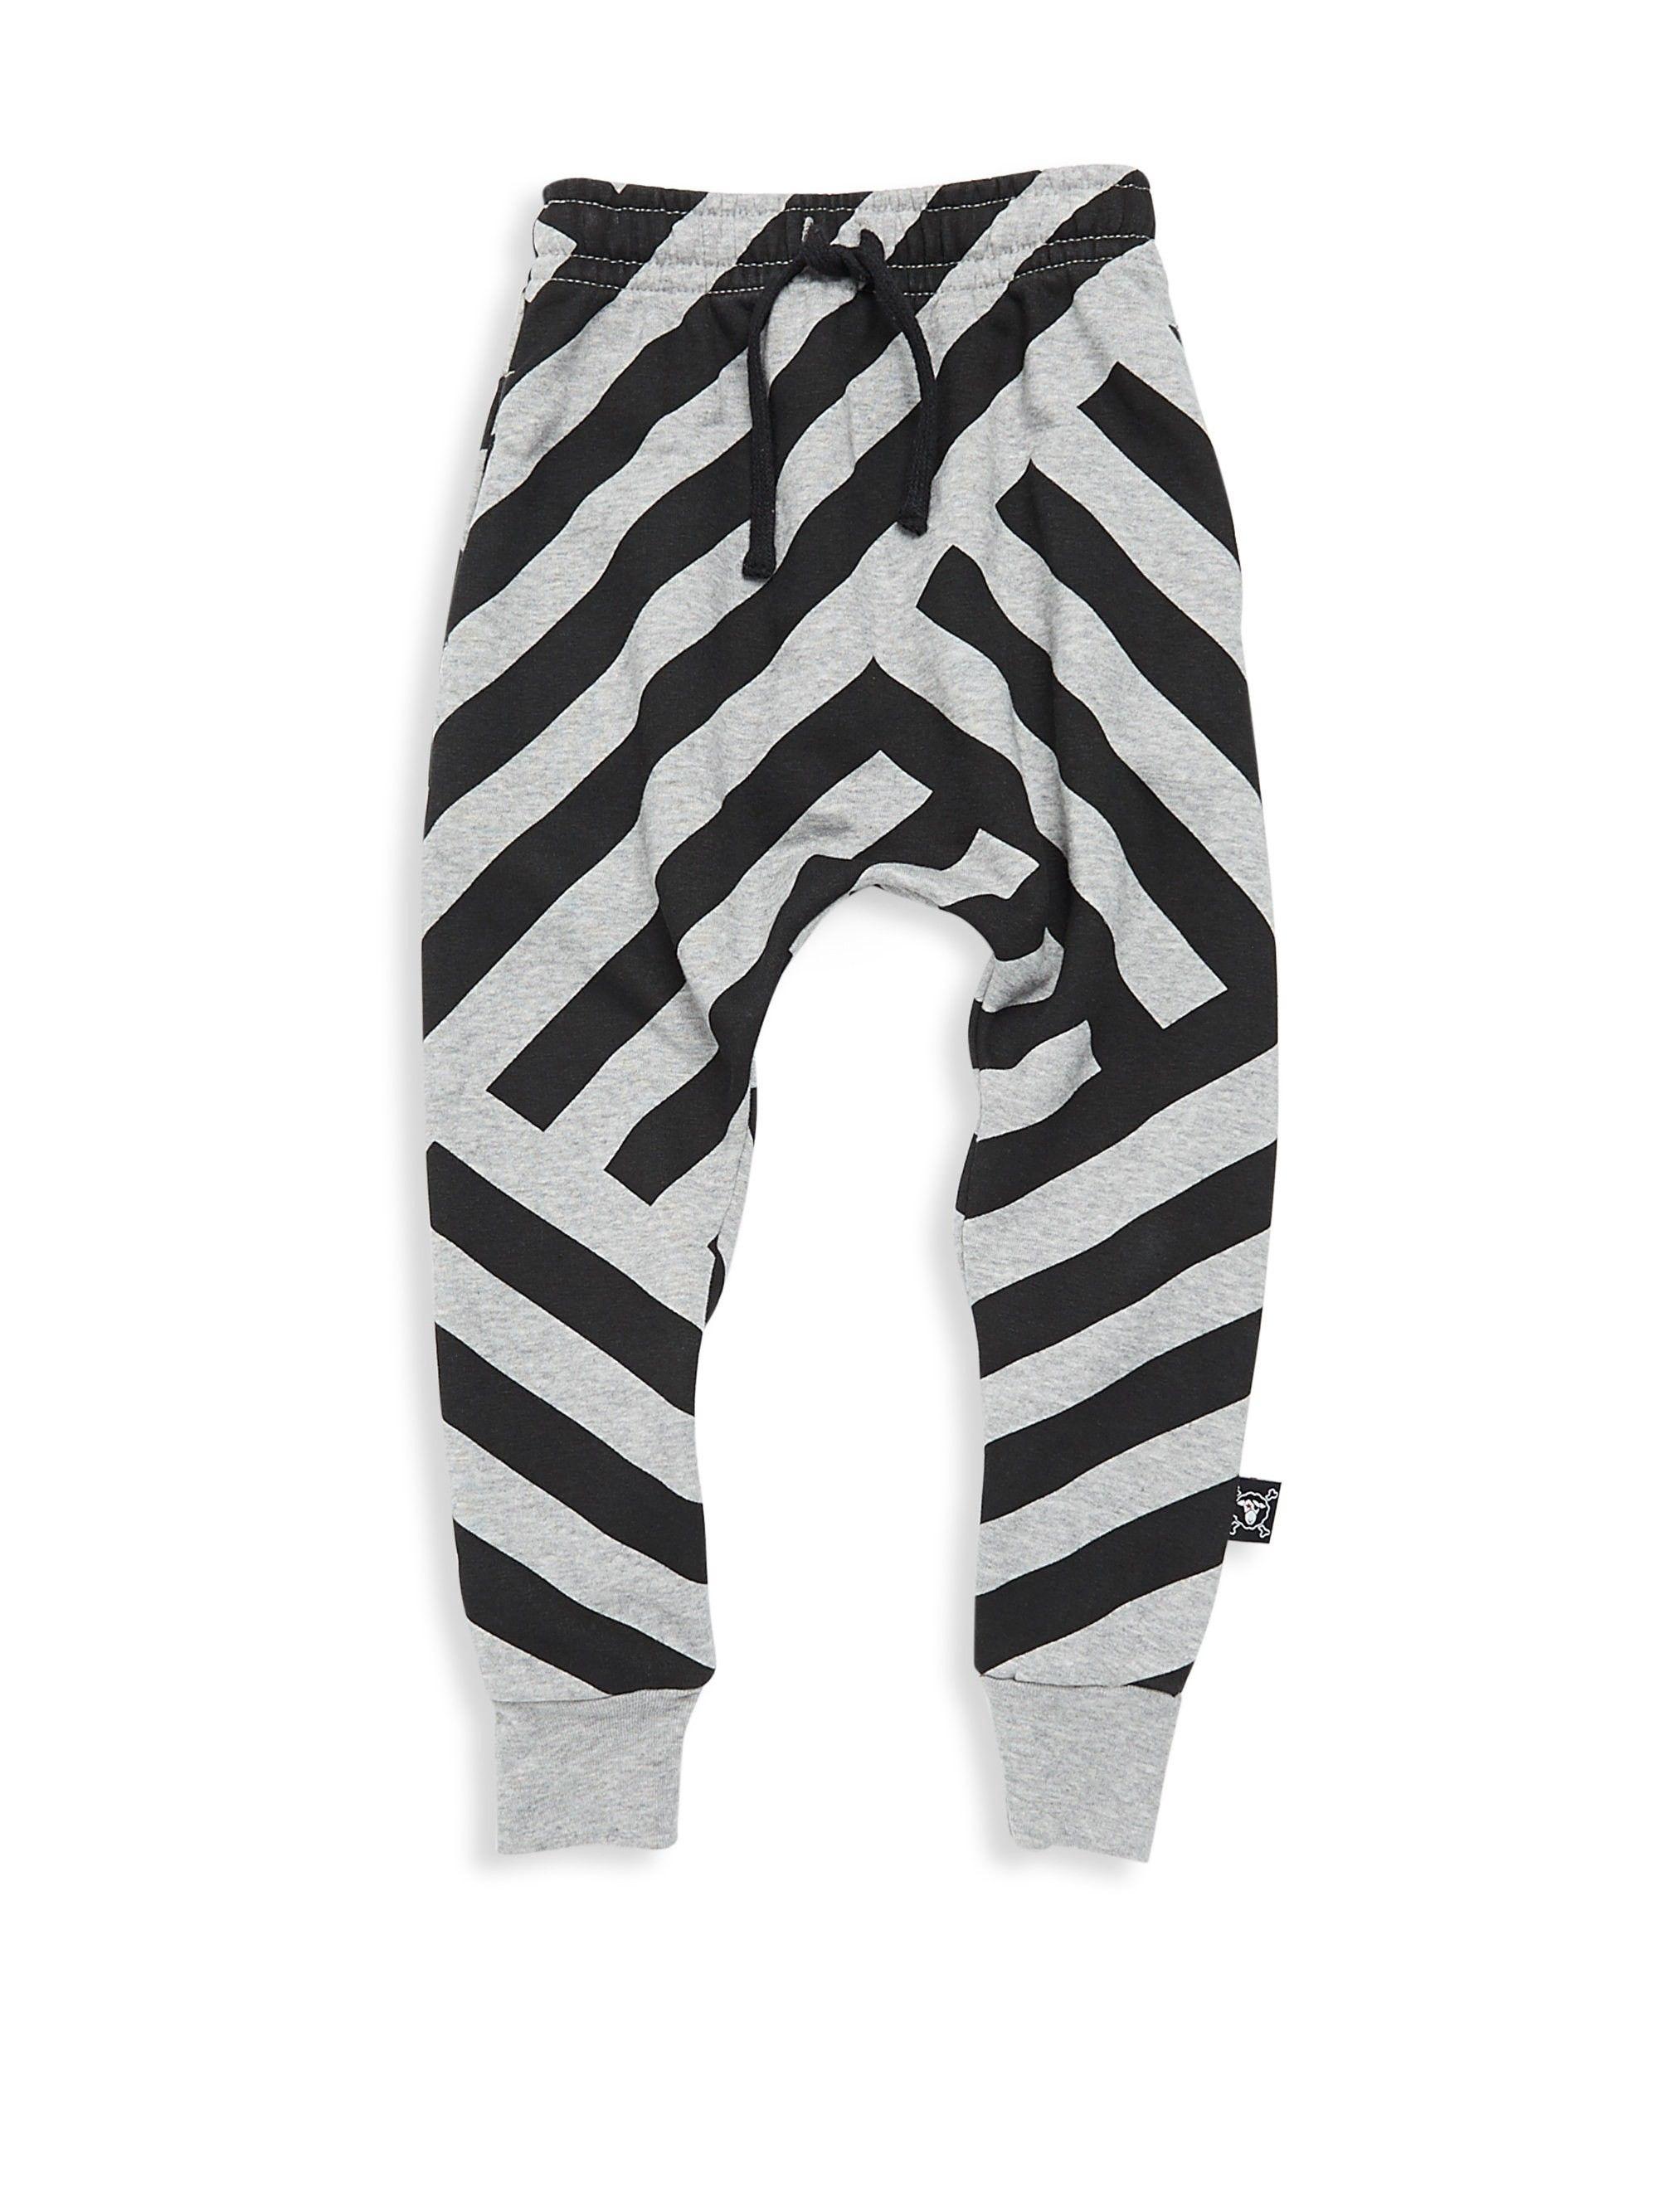 534f6aec9 Nununu Baby Boy's, Little Boy's & Striped Baggy Pants - Heather Grey 12-18  Months